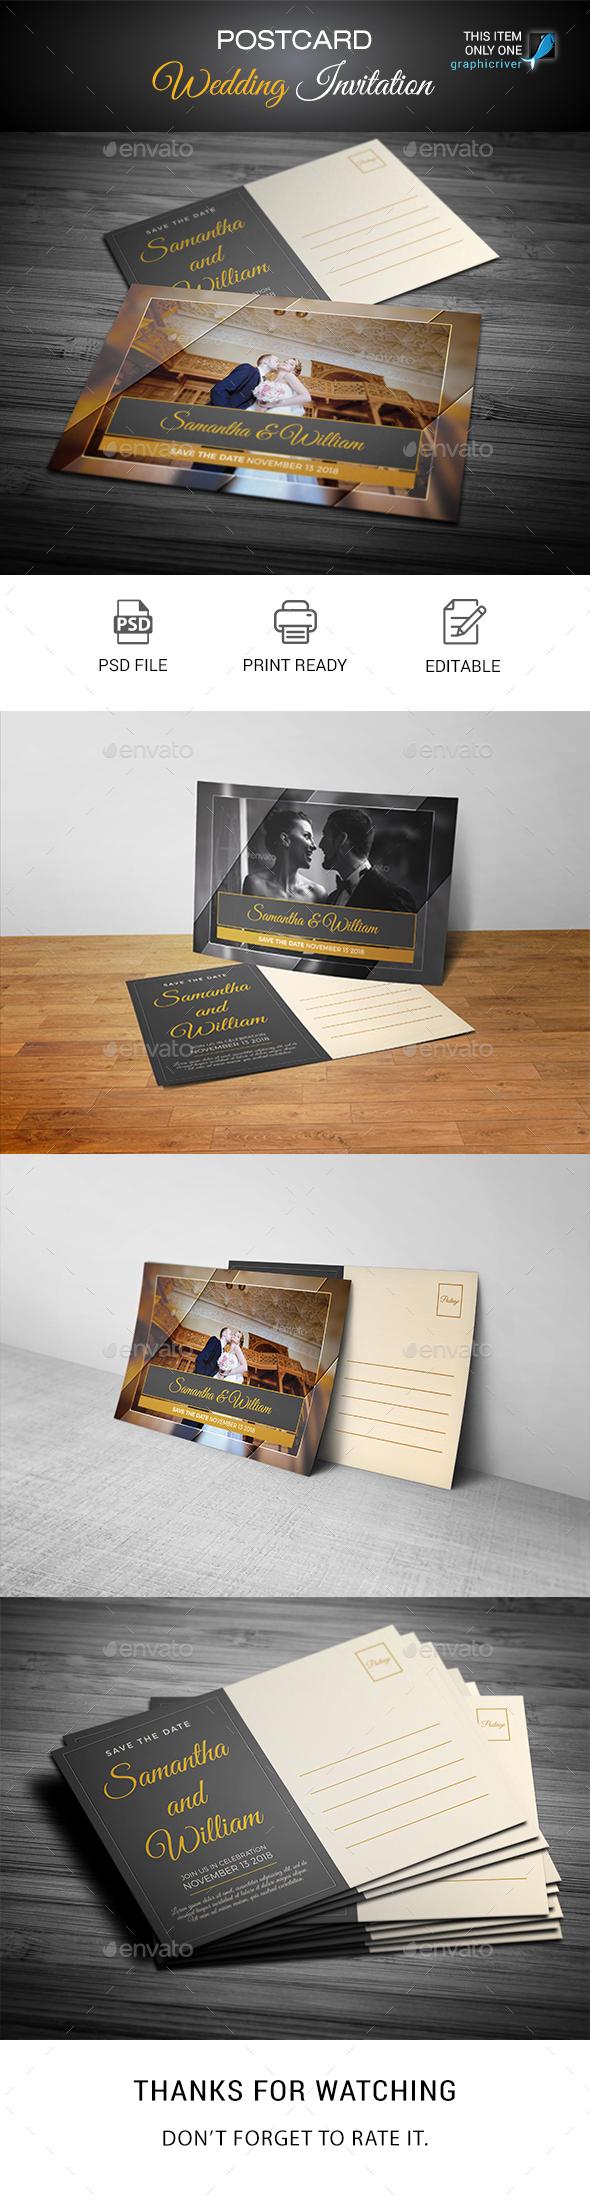 GraphicRiver Post Card Wedding Invitation Templates 21048610